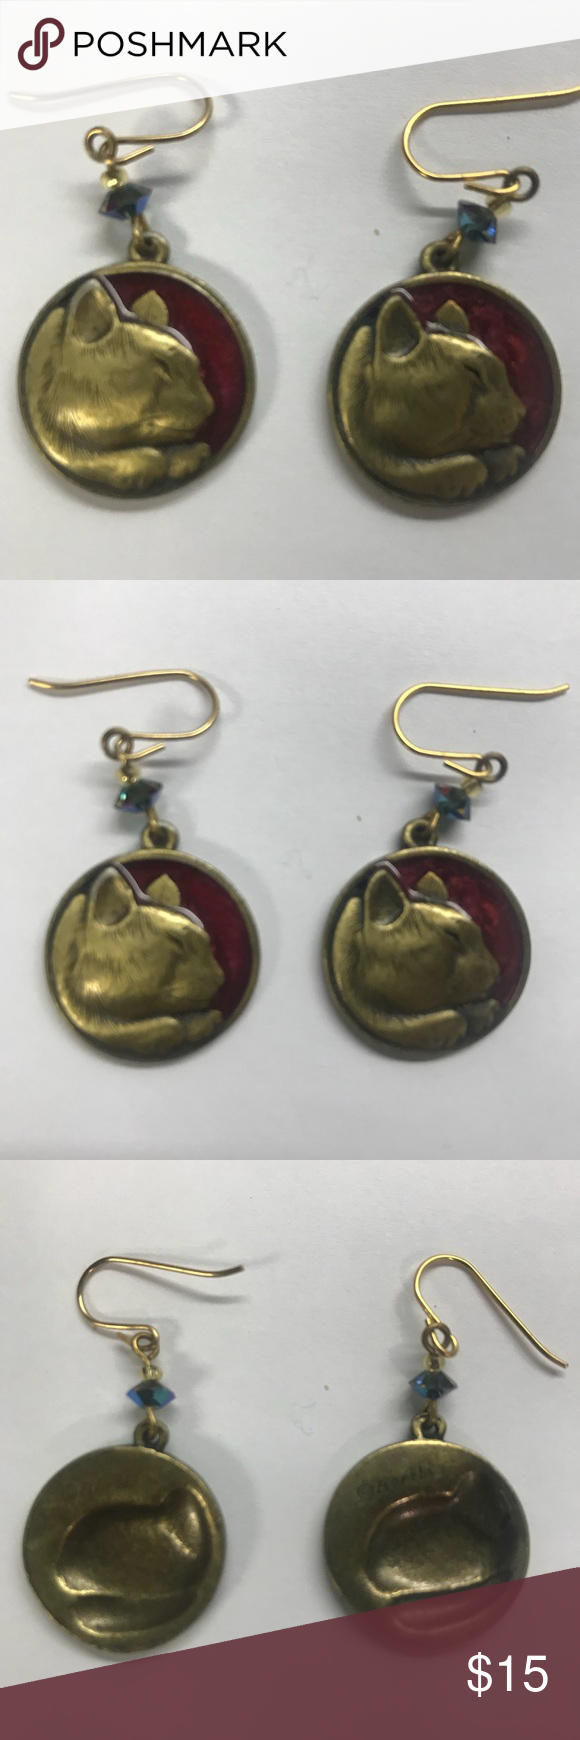 Vintage Edgar Berebi Cat Earrings These Sweet Kitties Are From The 1980 S